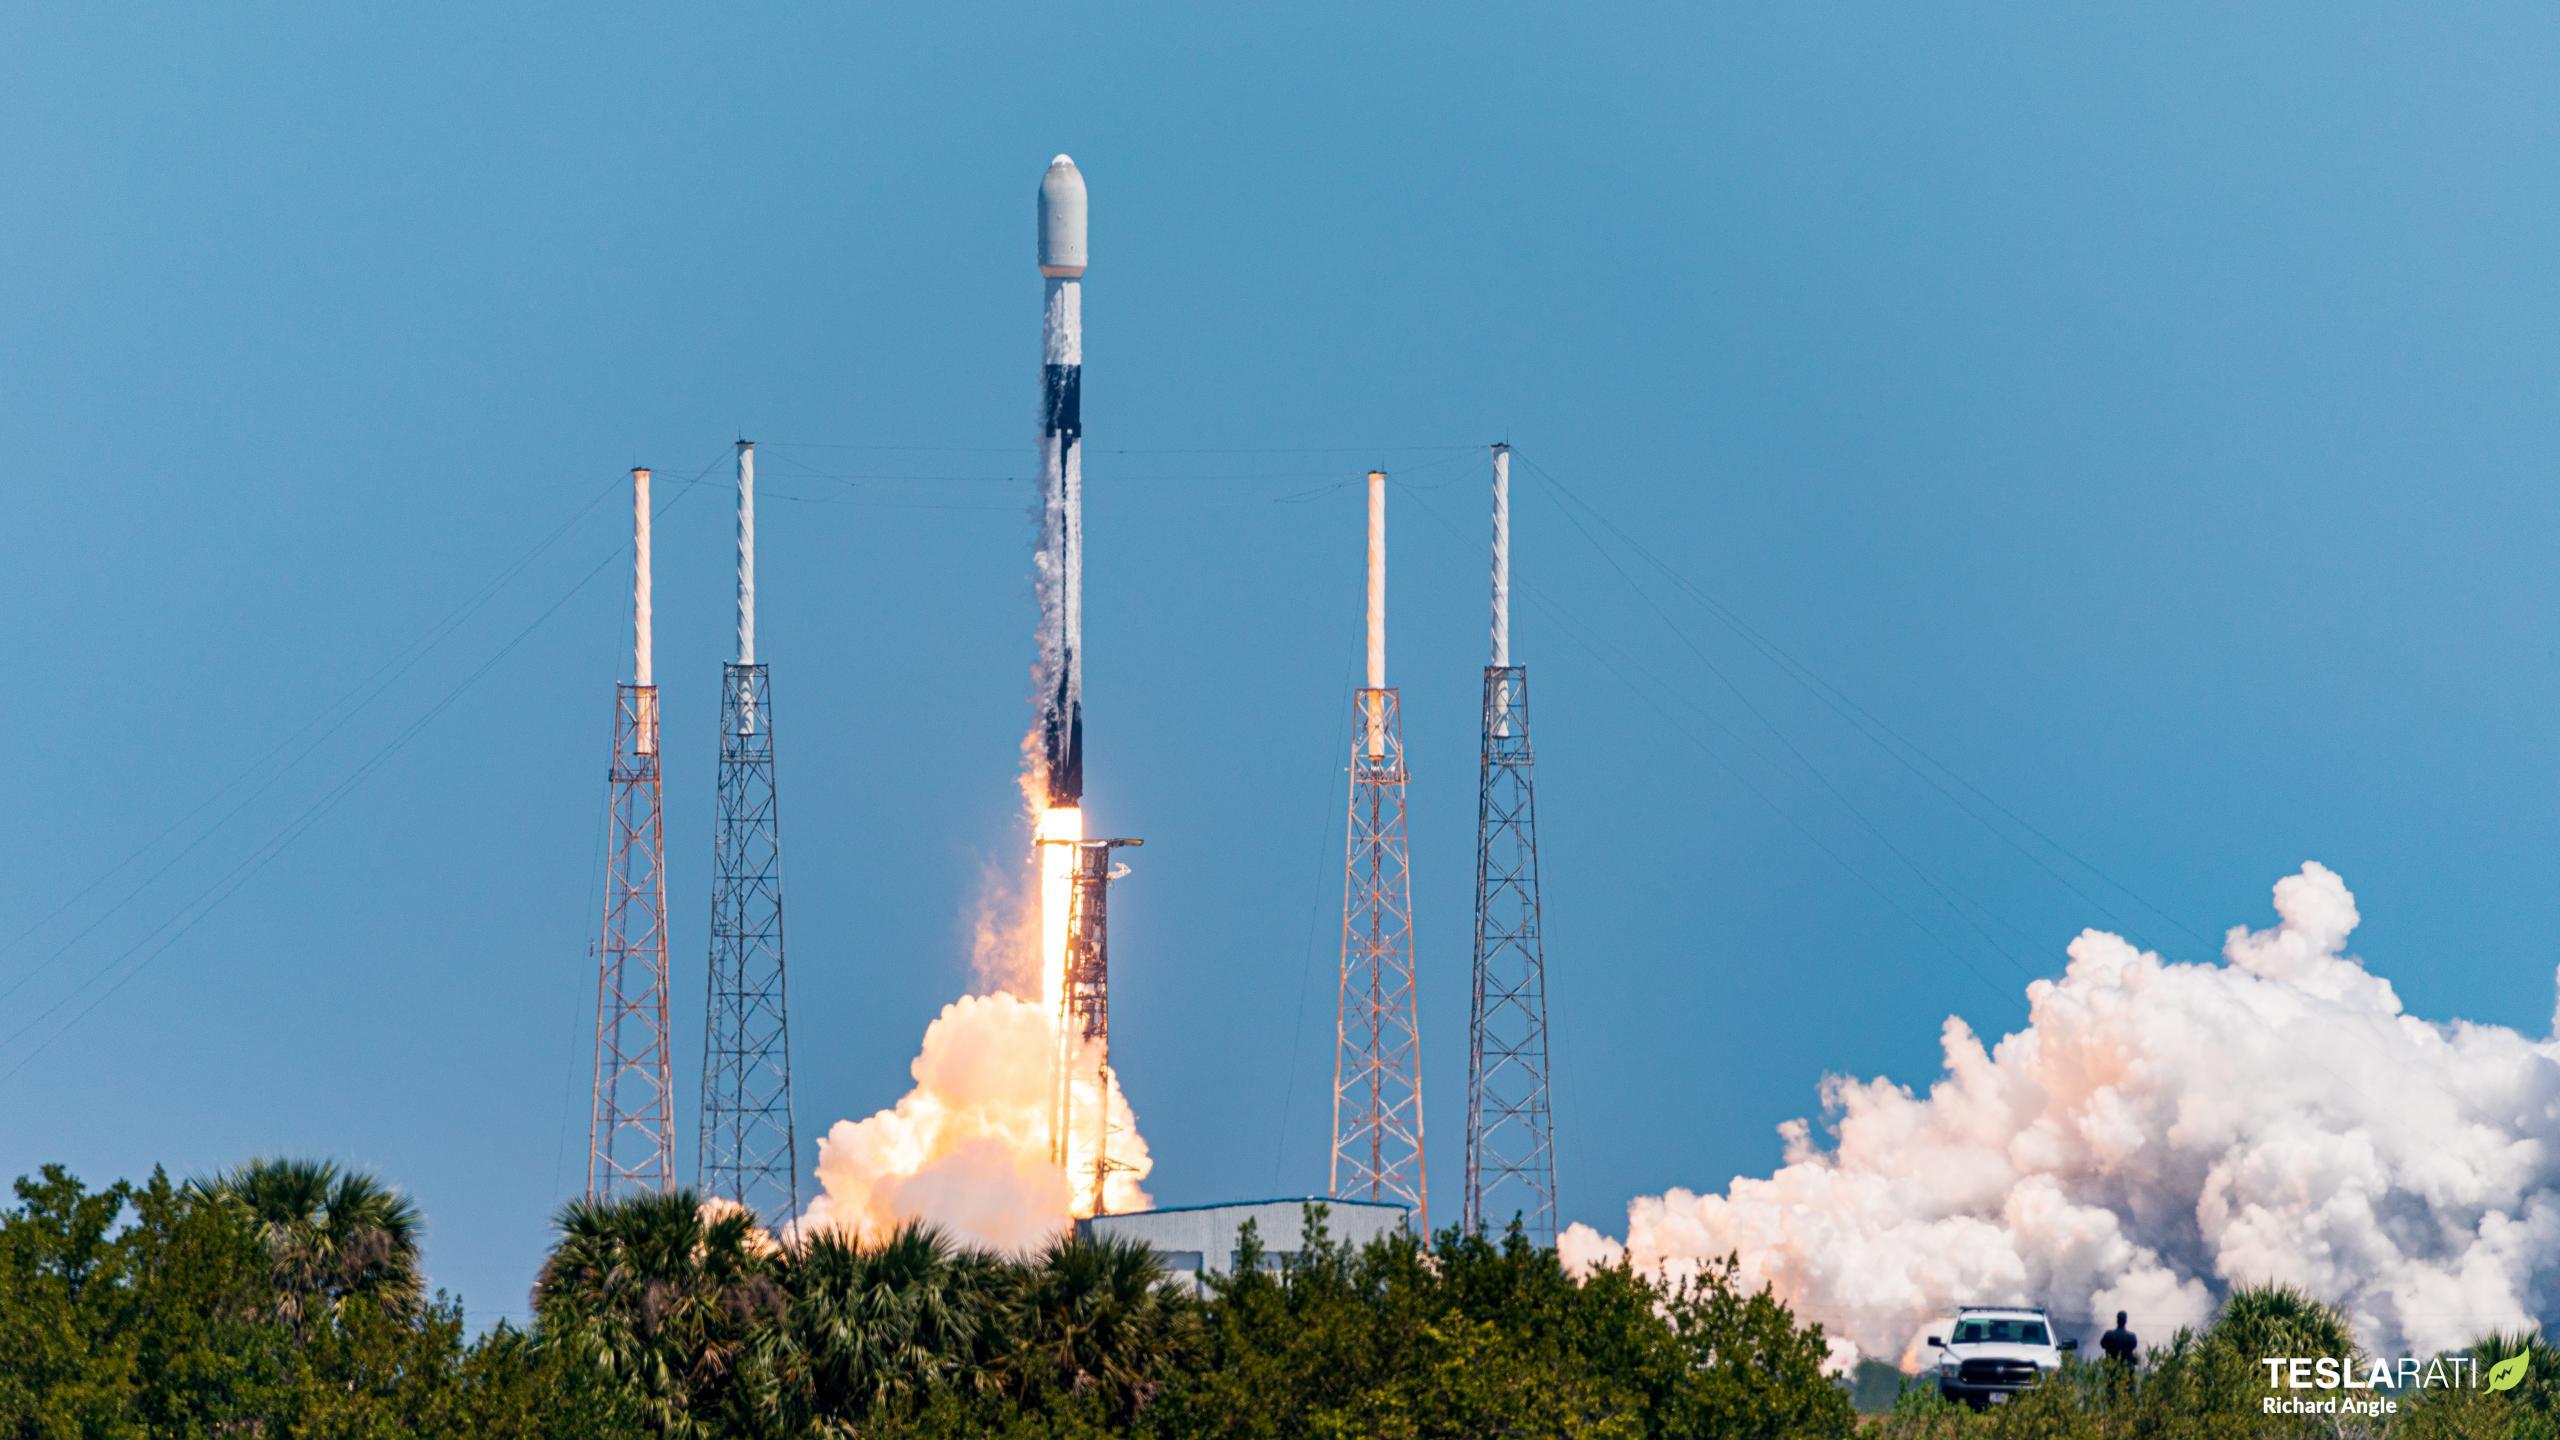 Starlink-23 Falcon 9 B1058 LC-40 040721 (Richard Angle) launch 1 (c)